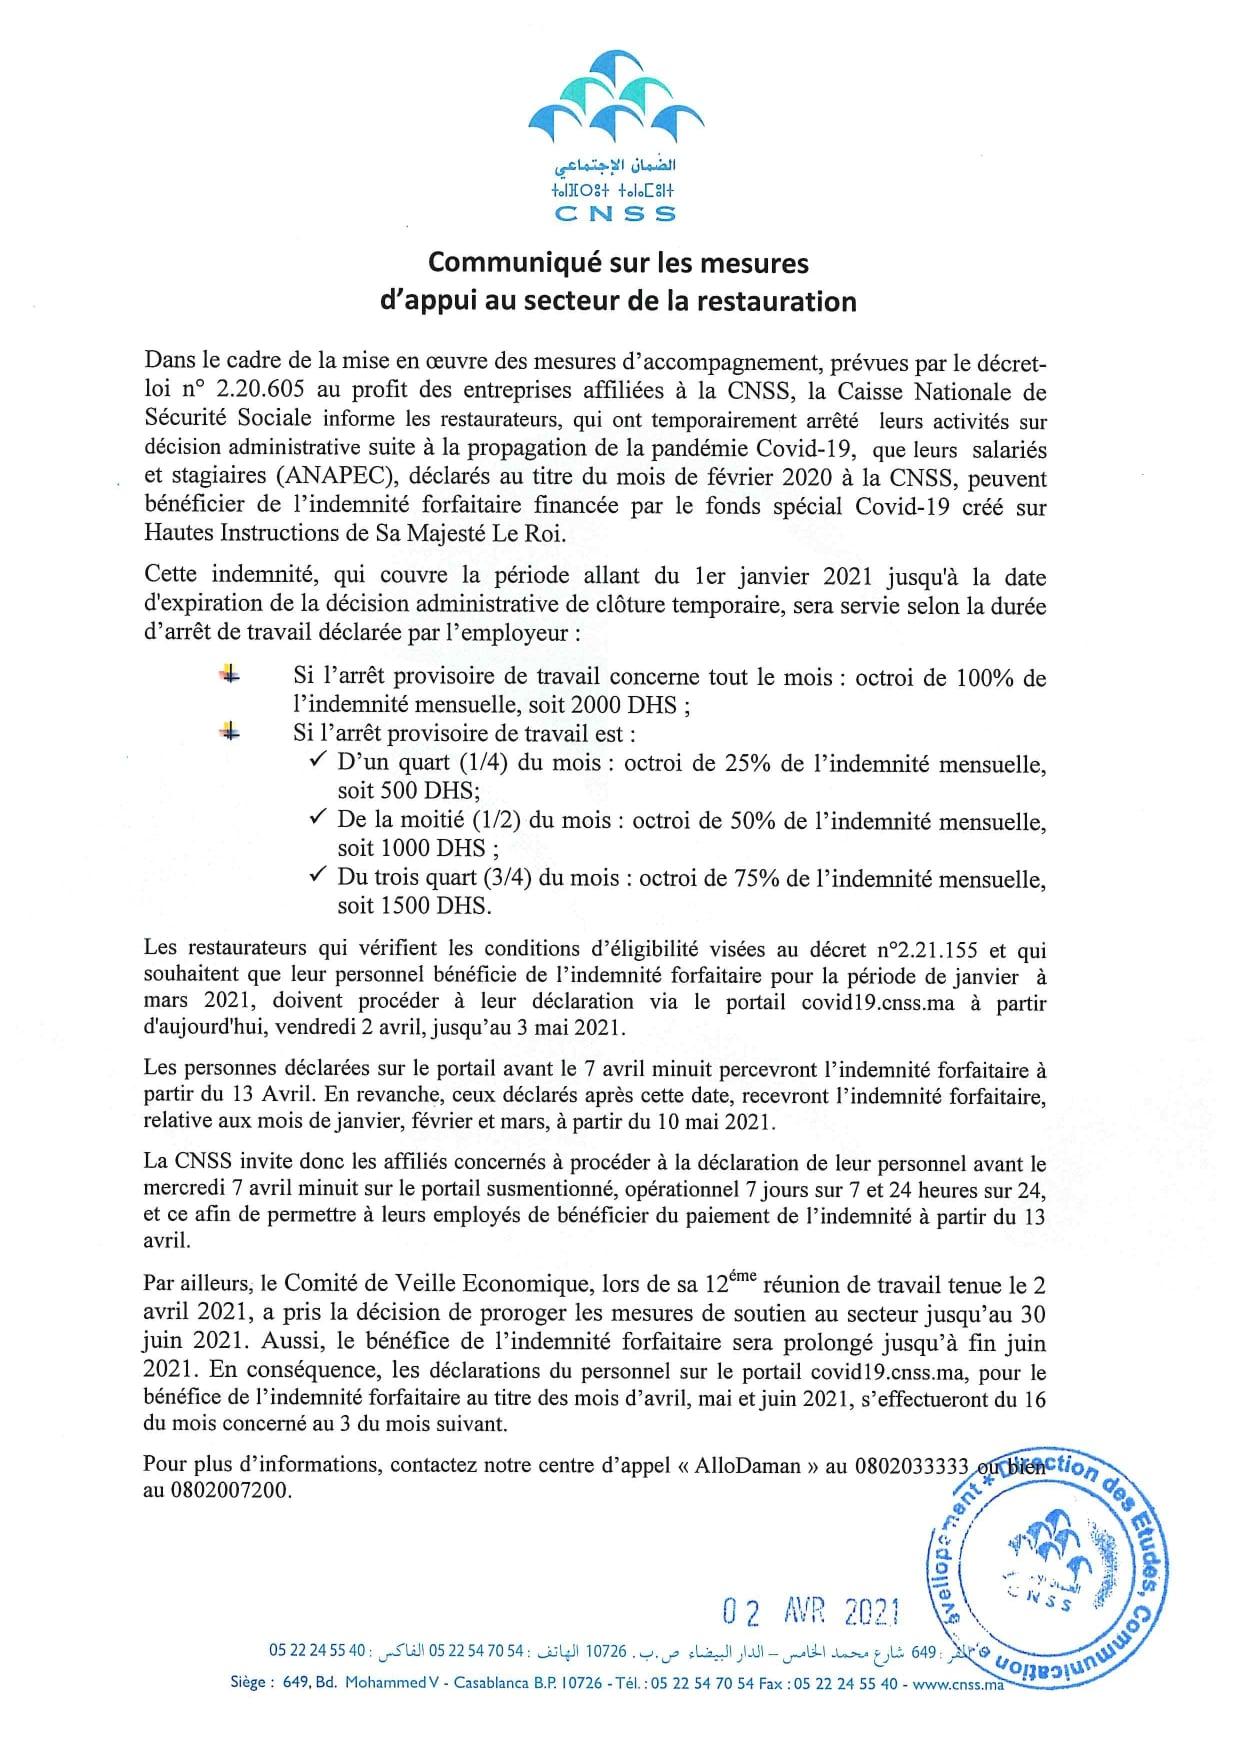 CNSS يعلن شروط استفادة أجراء ومتدربي المطاعم من تعويضات صندوق كورونا